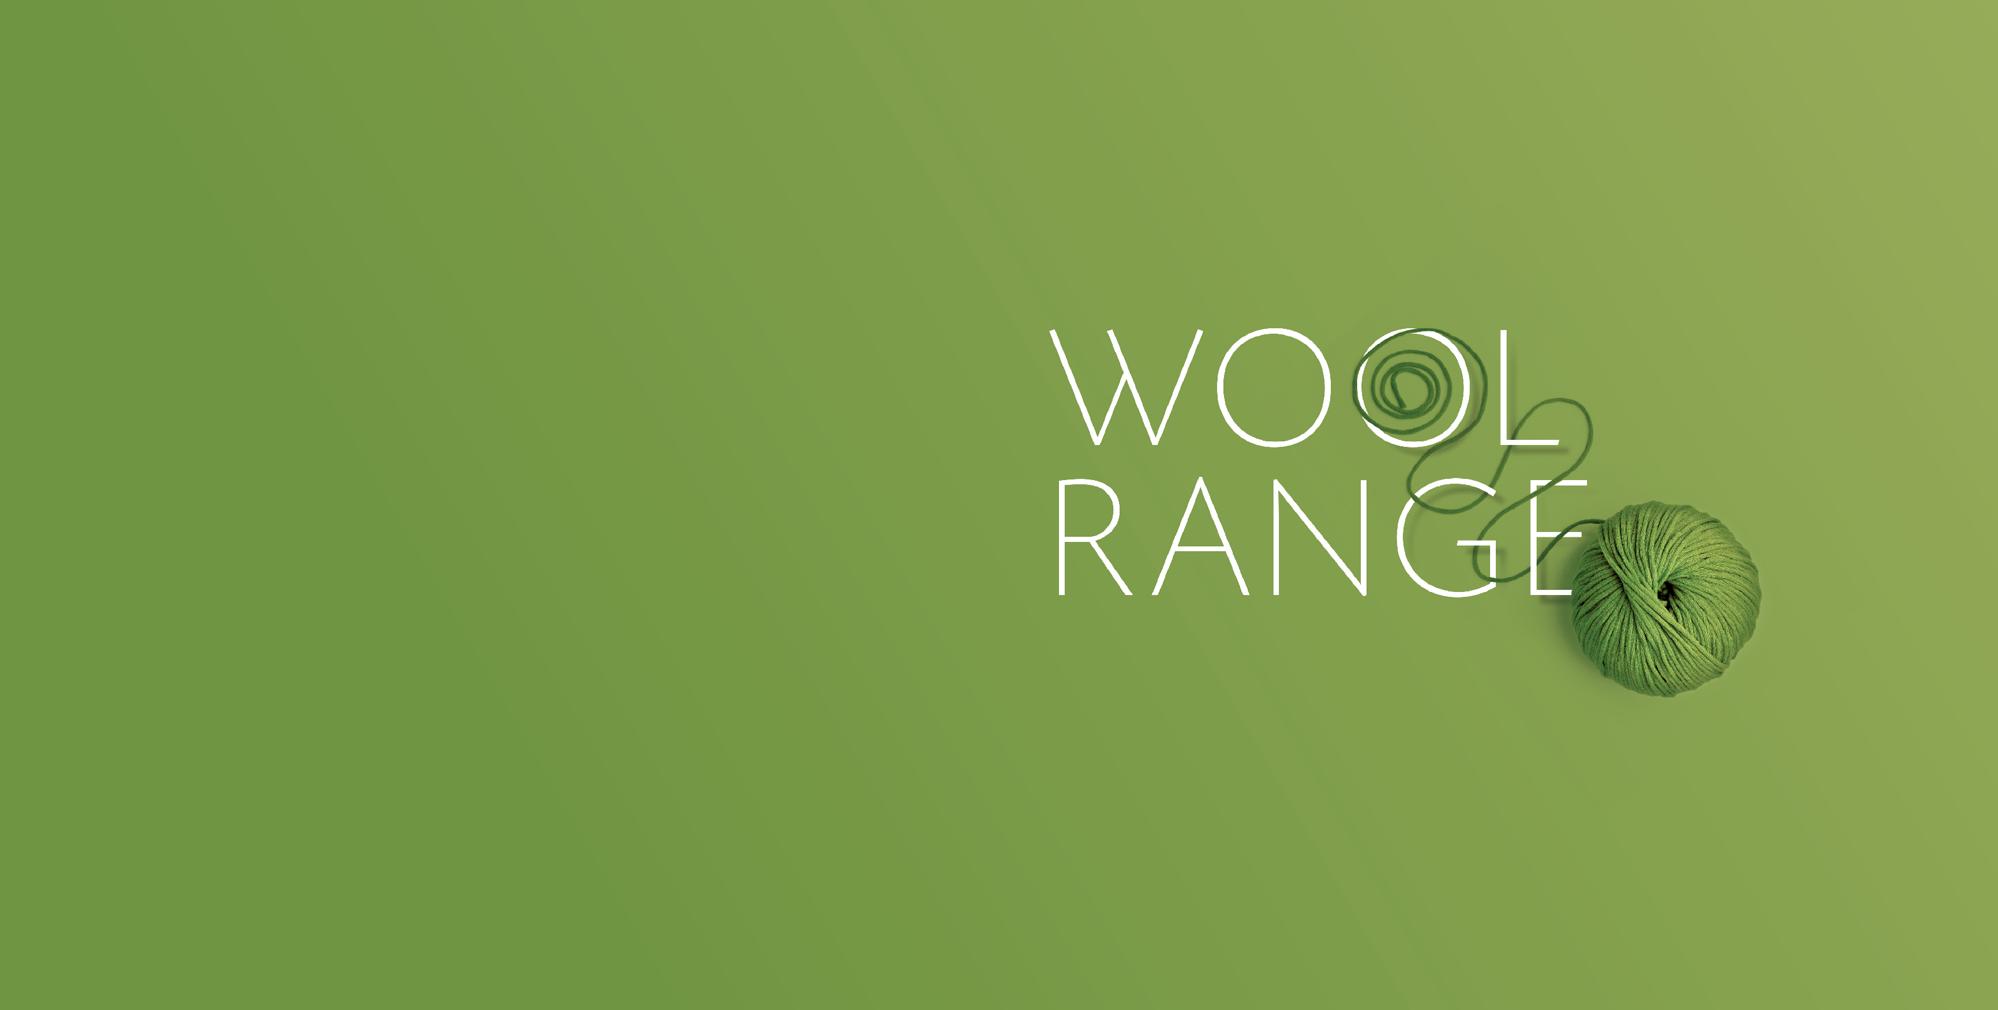 Wool Range